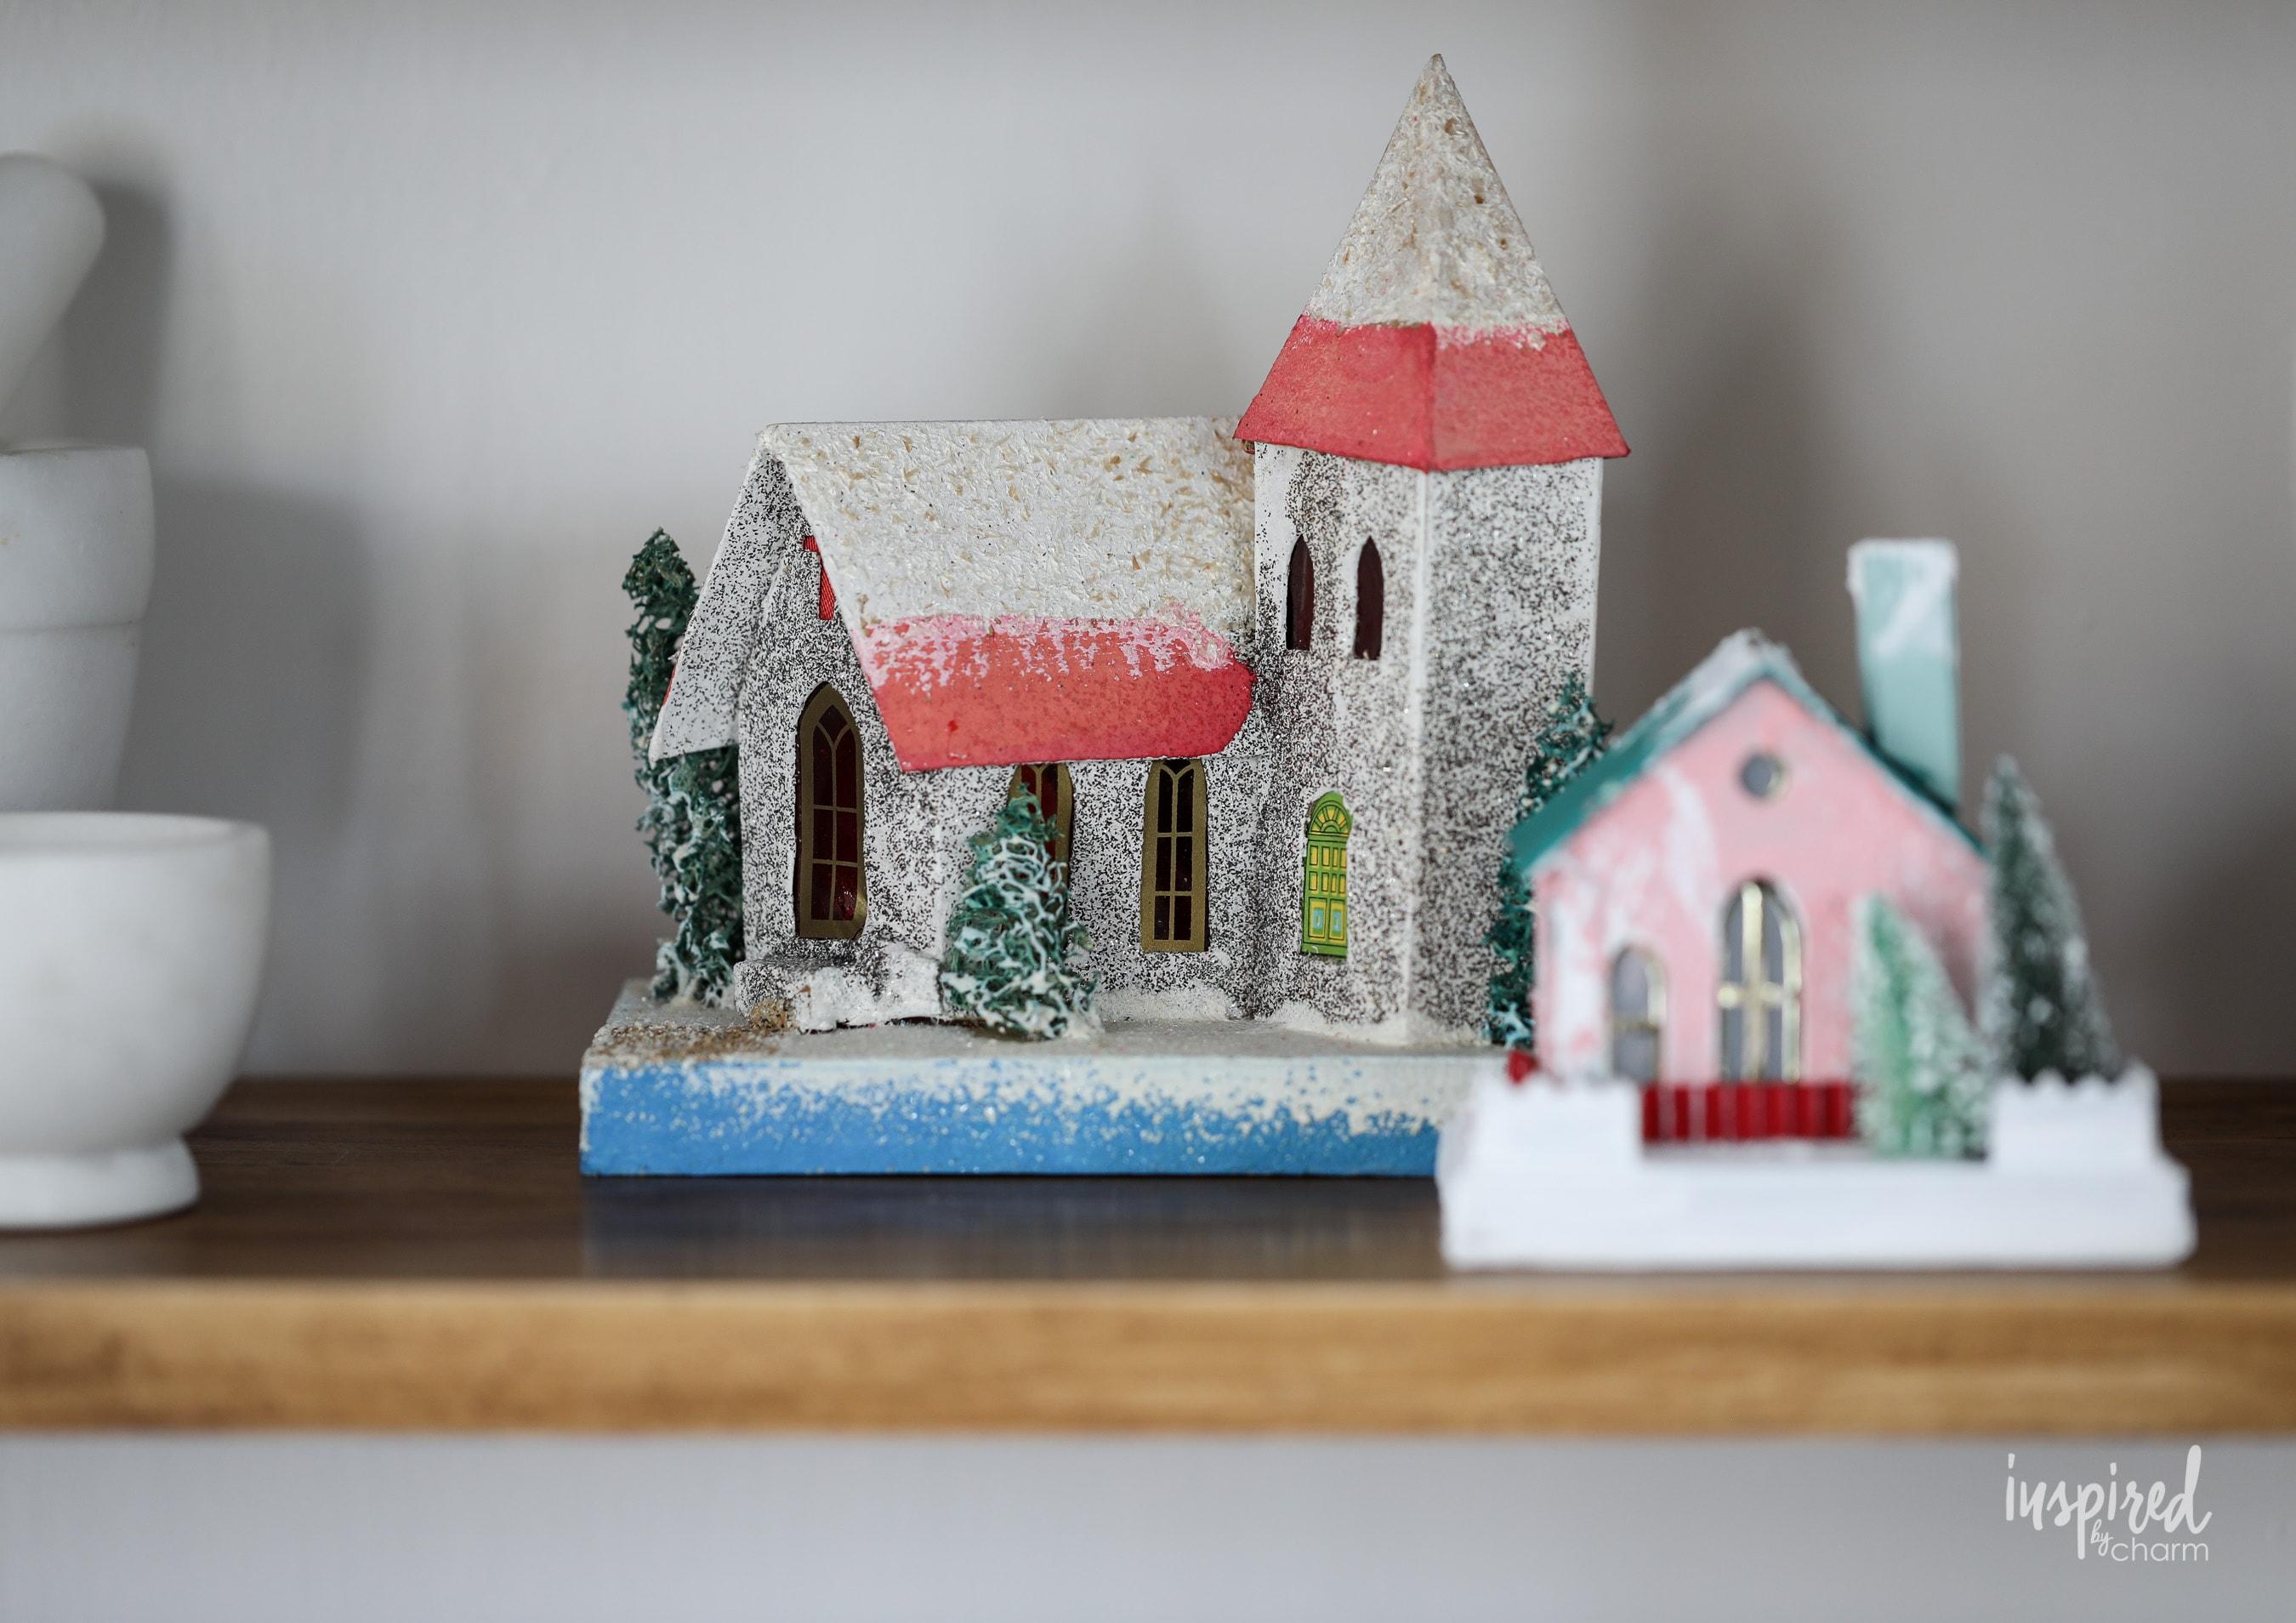 Vintage Christmas Cabinet Decorating Ideas #christmas #vintage #putz #holiday #decor #ideas